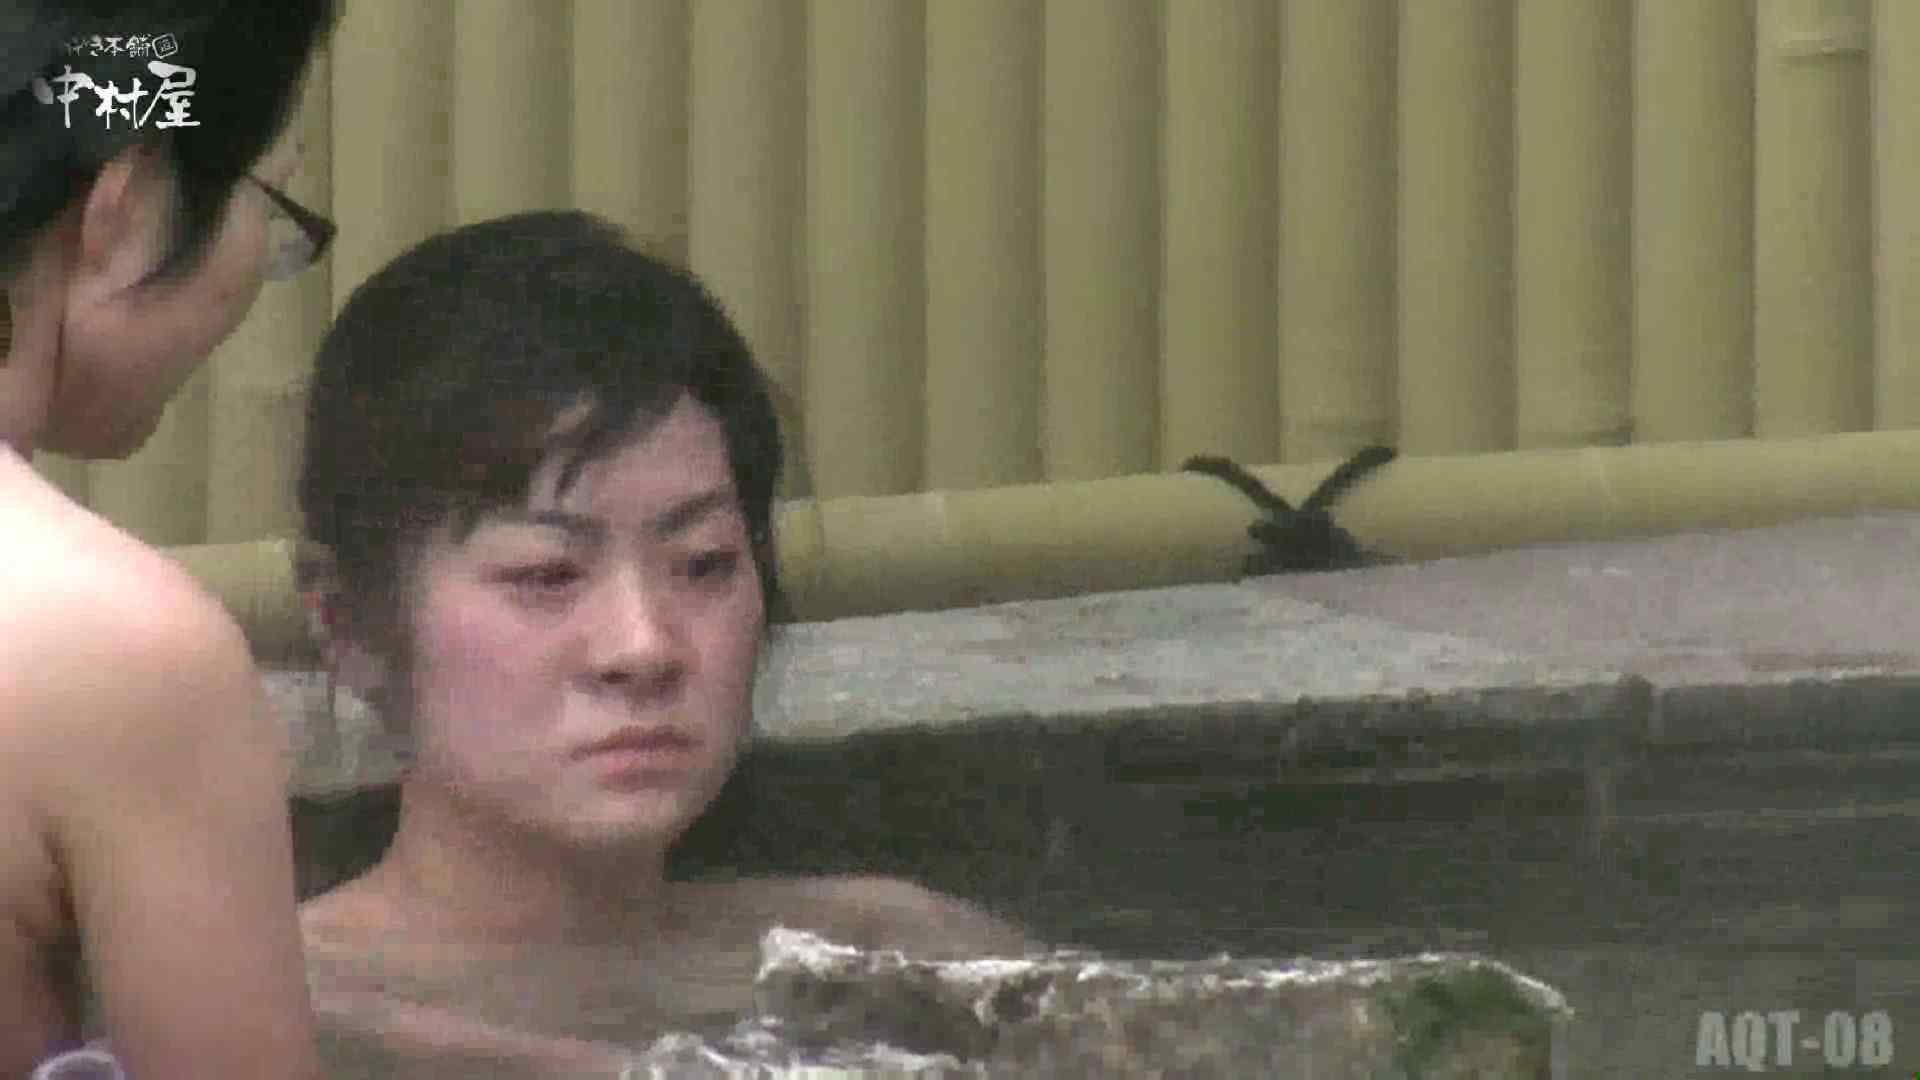 Aquaな露天風呂Vol.872潜入盗撮露天風呂八判湯 其の二 露天風呂 | 潜入  70連発 57